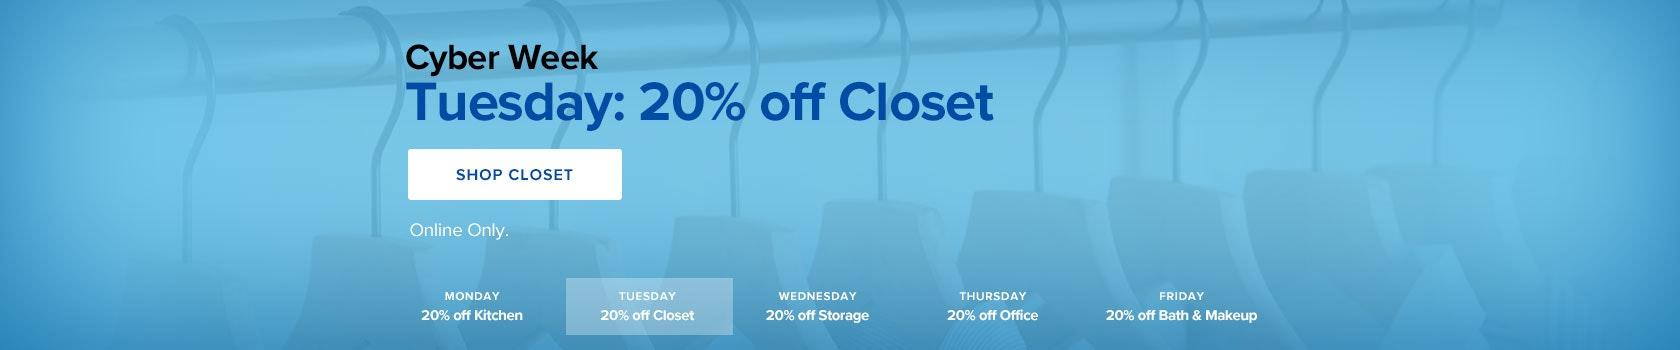 Cyber Week: Tuesday - 20% off Closet